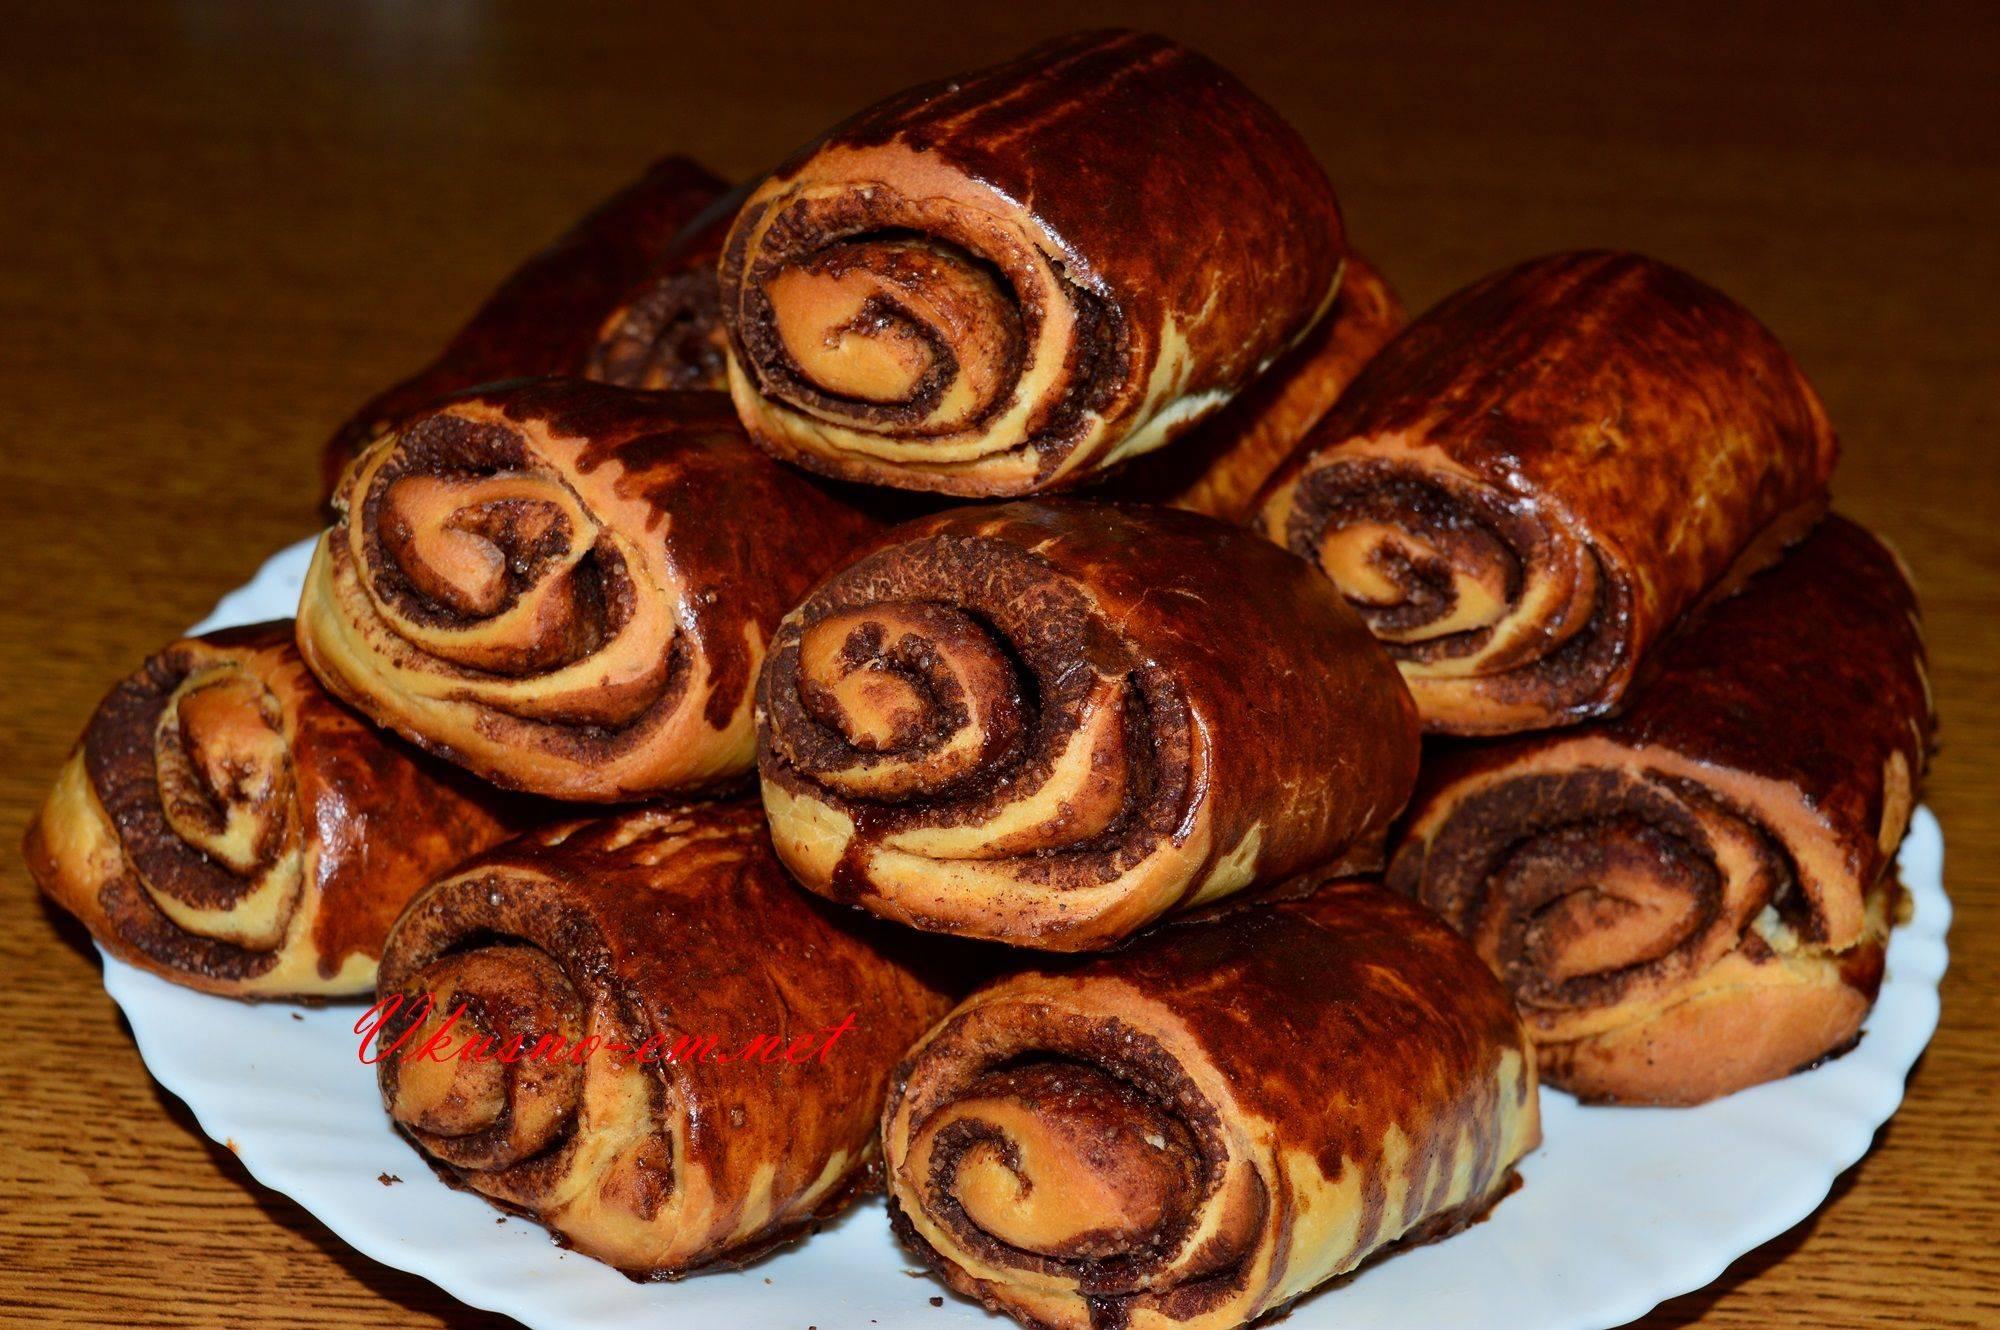 Дрожжевое тесто — рецепты пышных булочек с корицей